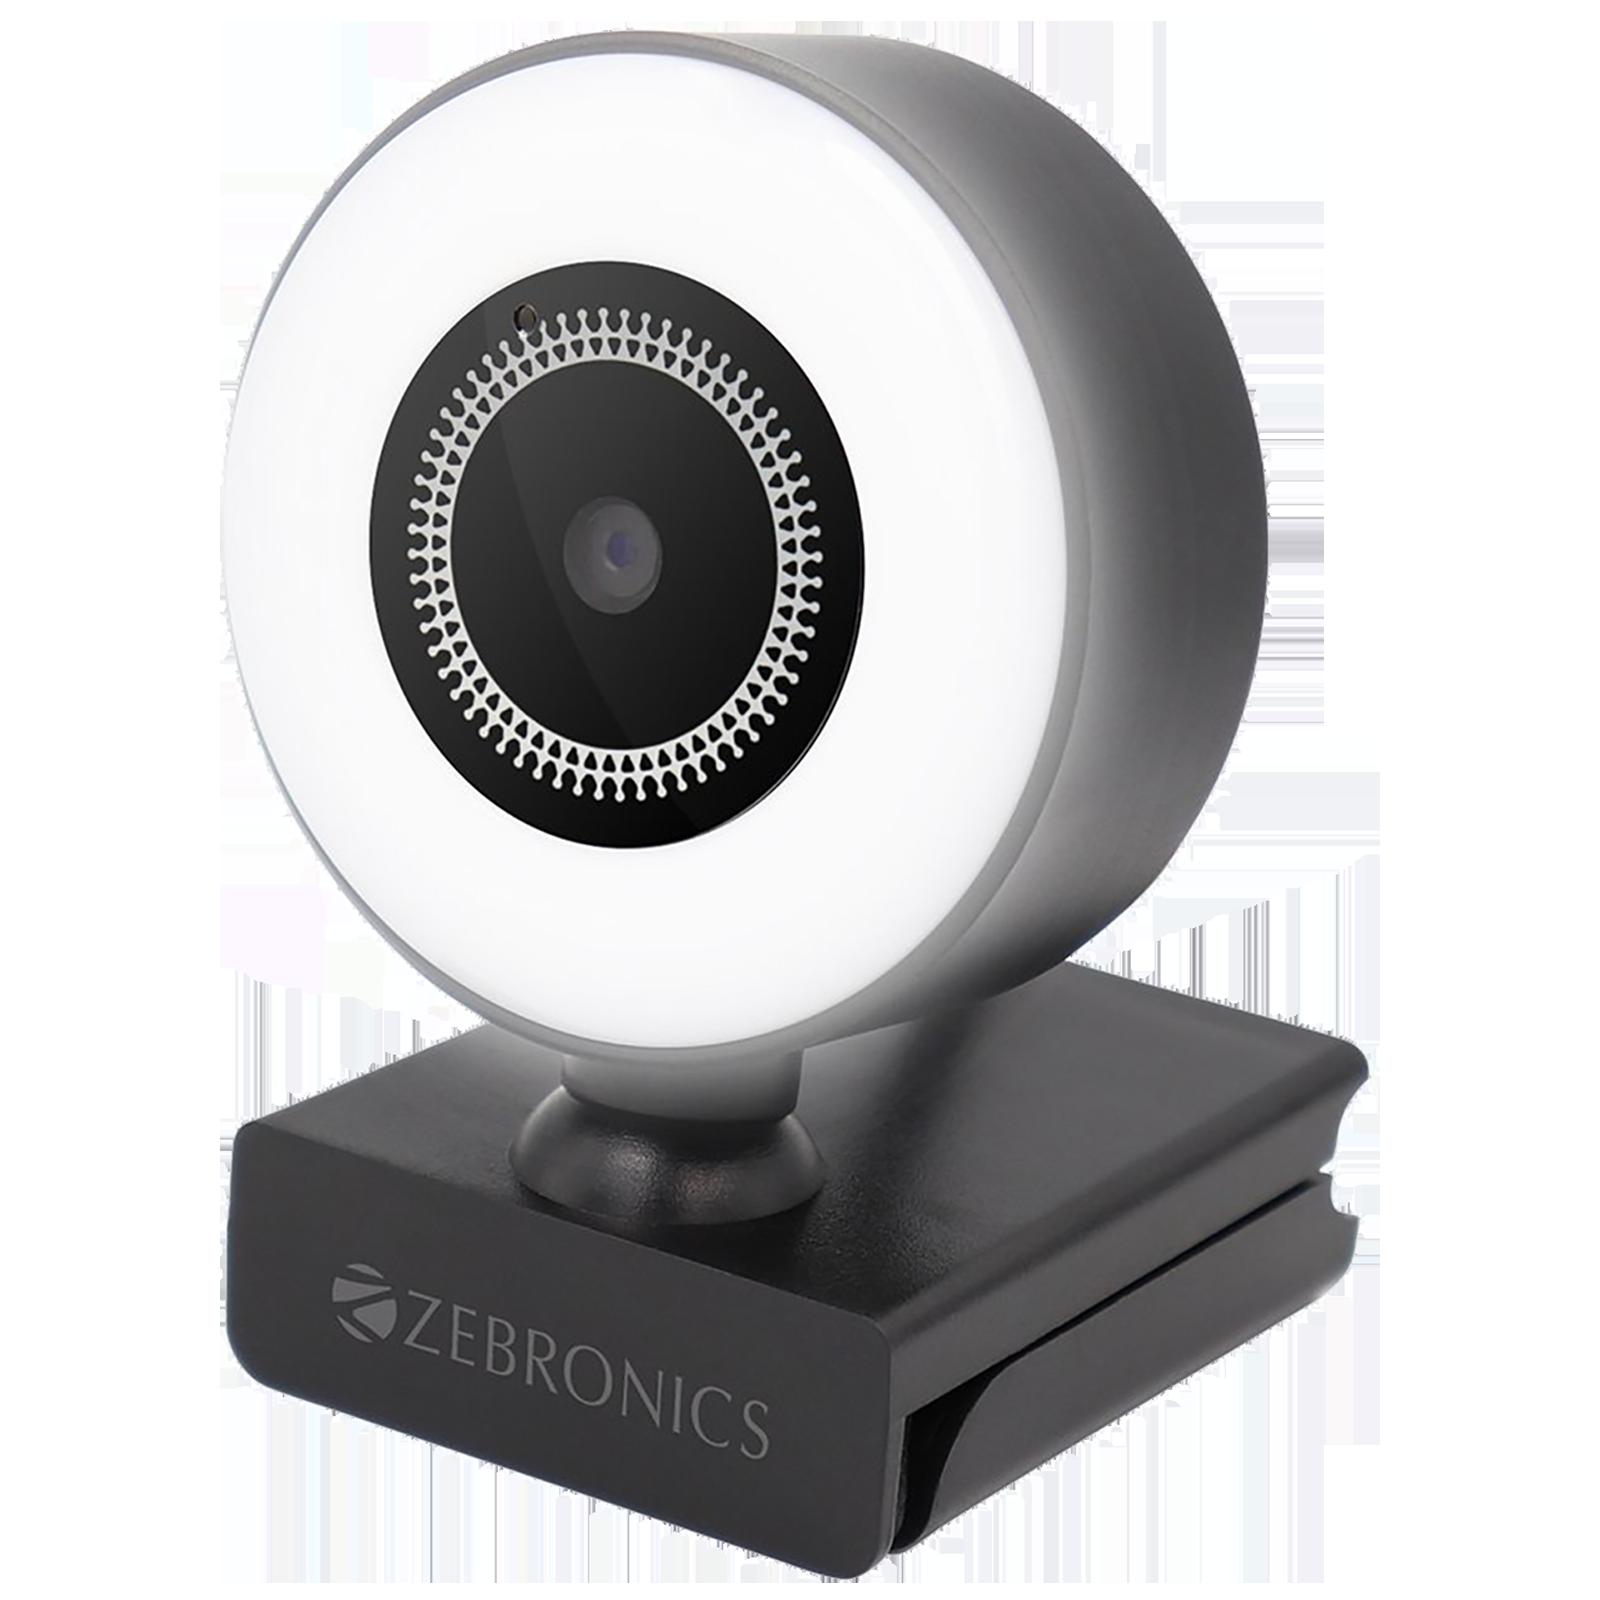 Zebronics USB Web Cam (16 LED Ring Light, ZEB-Ultimate Star, Black)_1